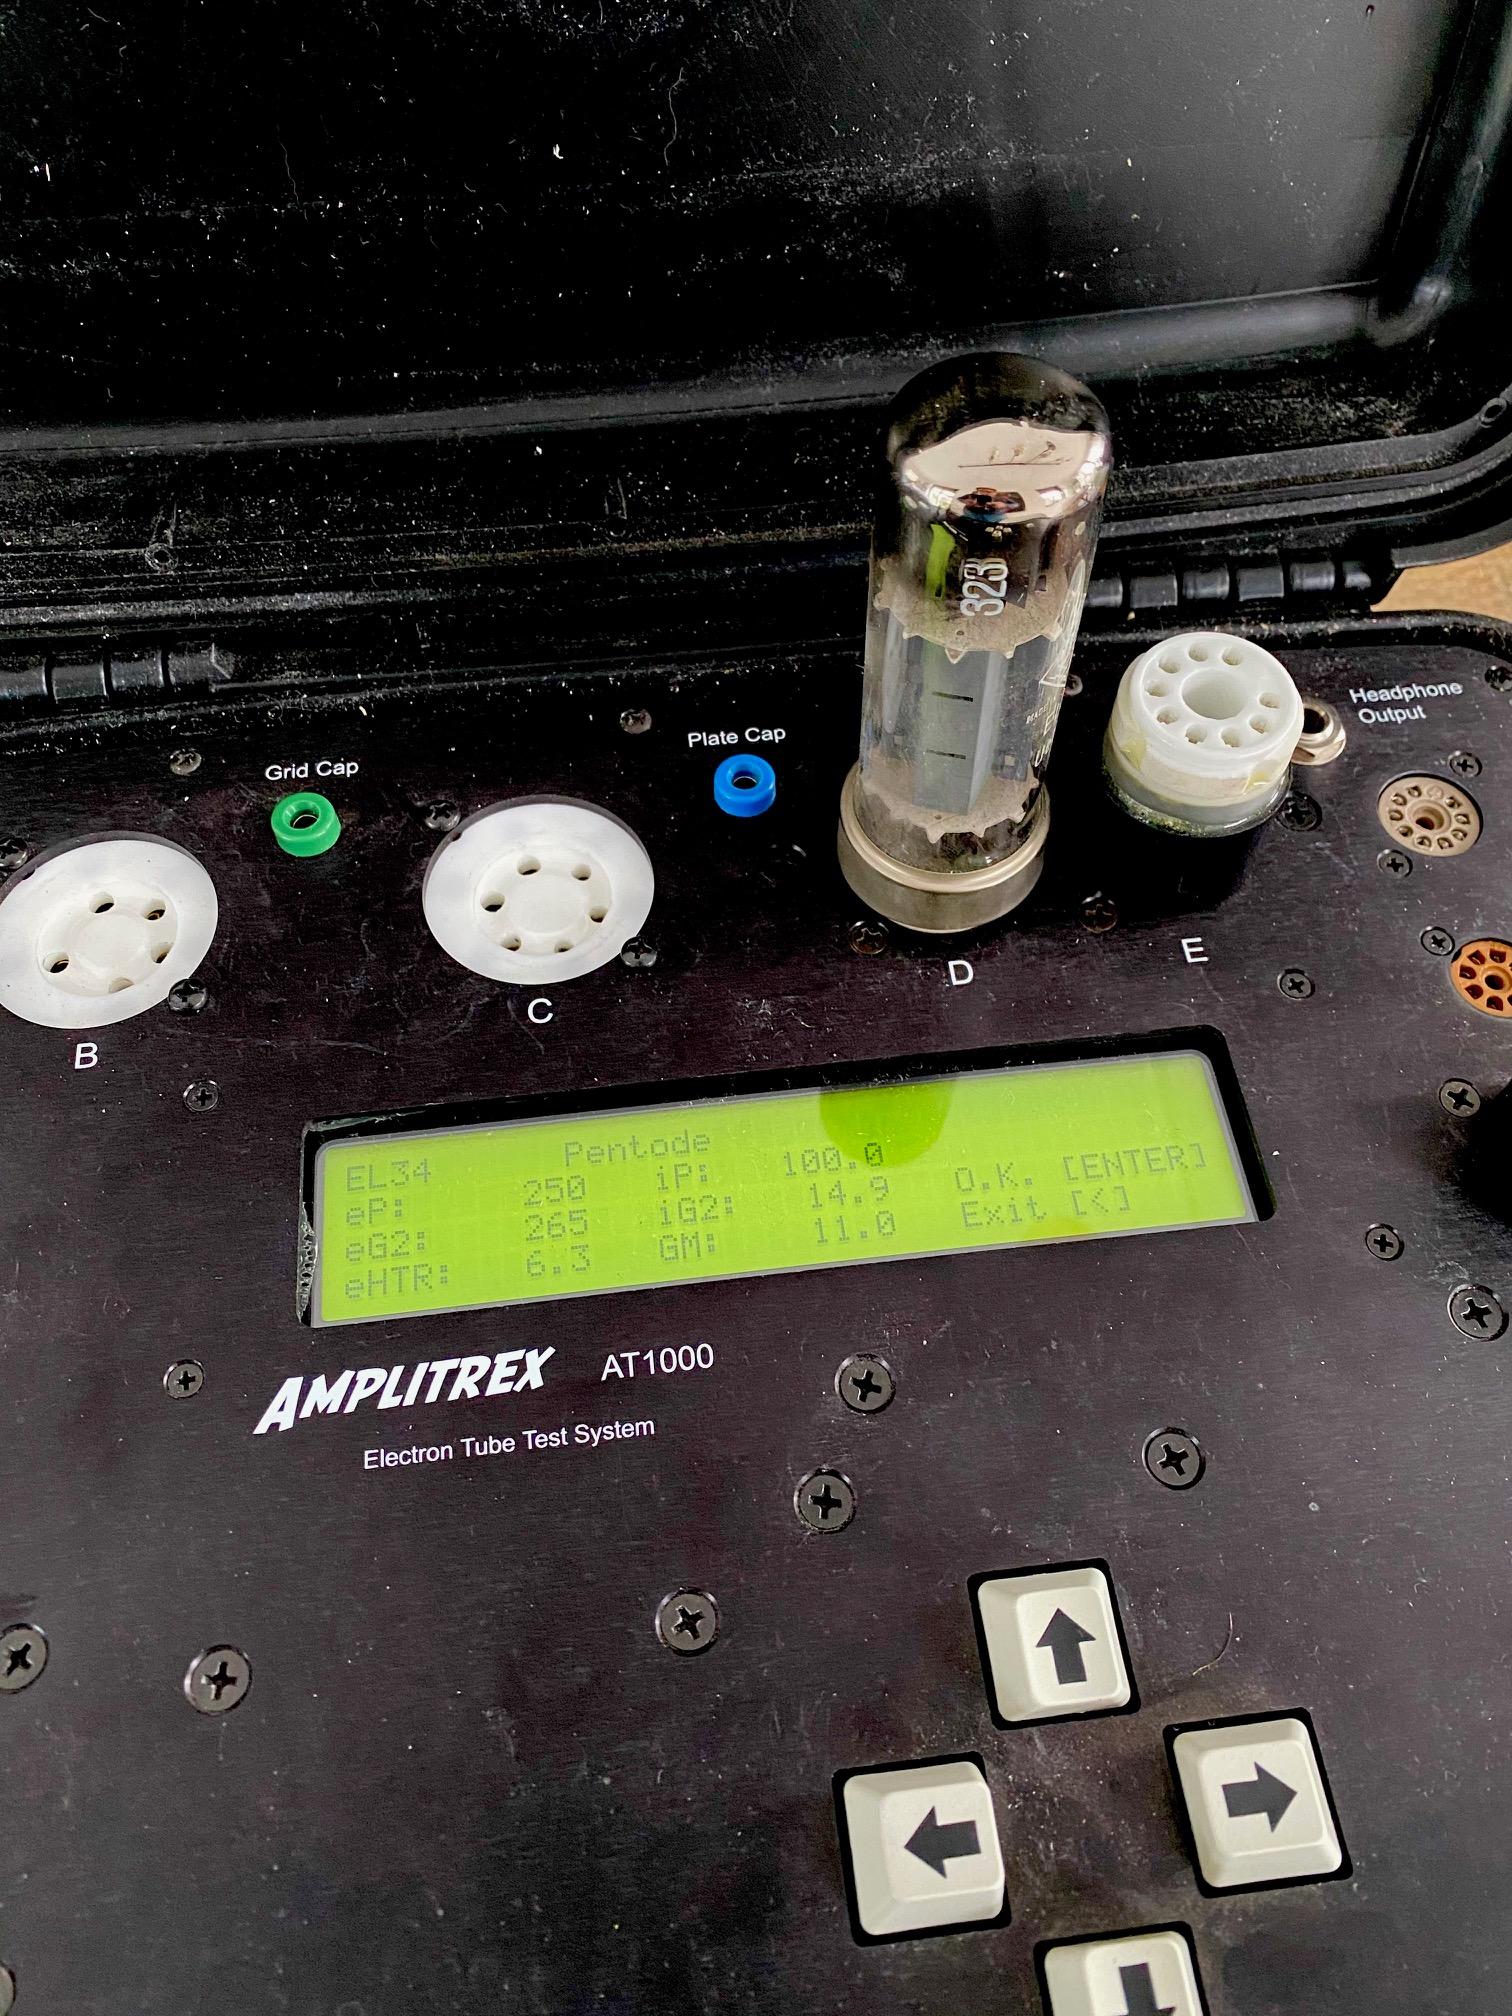 Amplitrex AT1000 tubetester